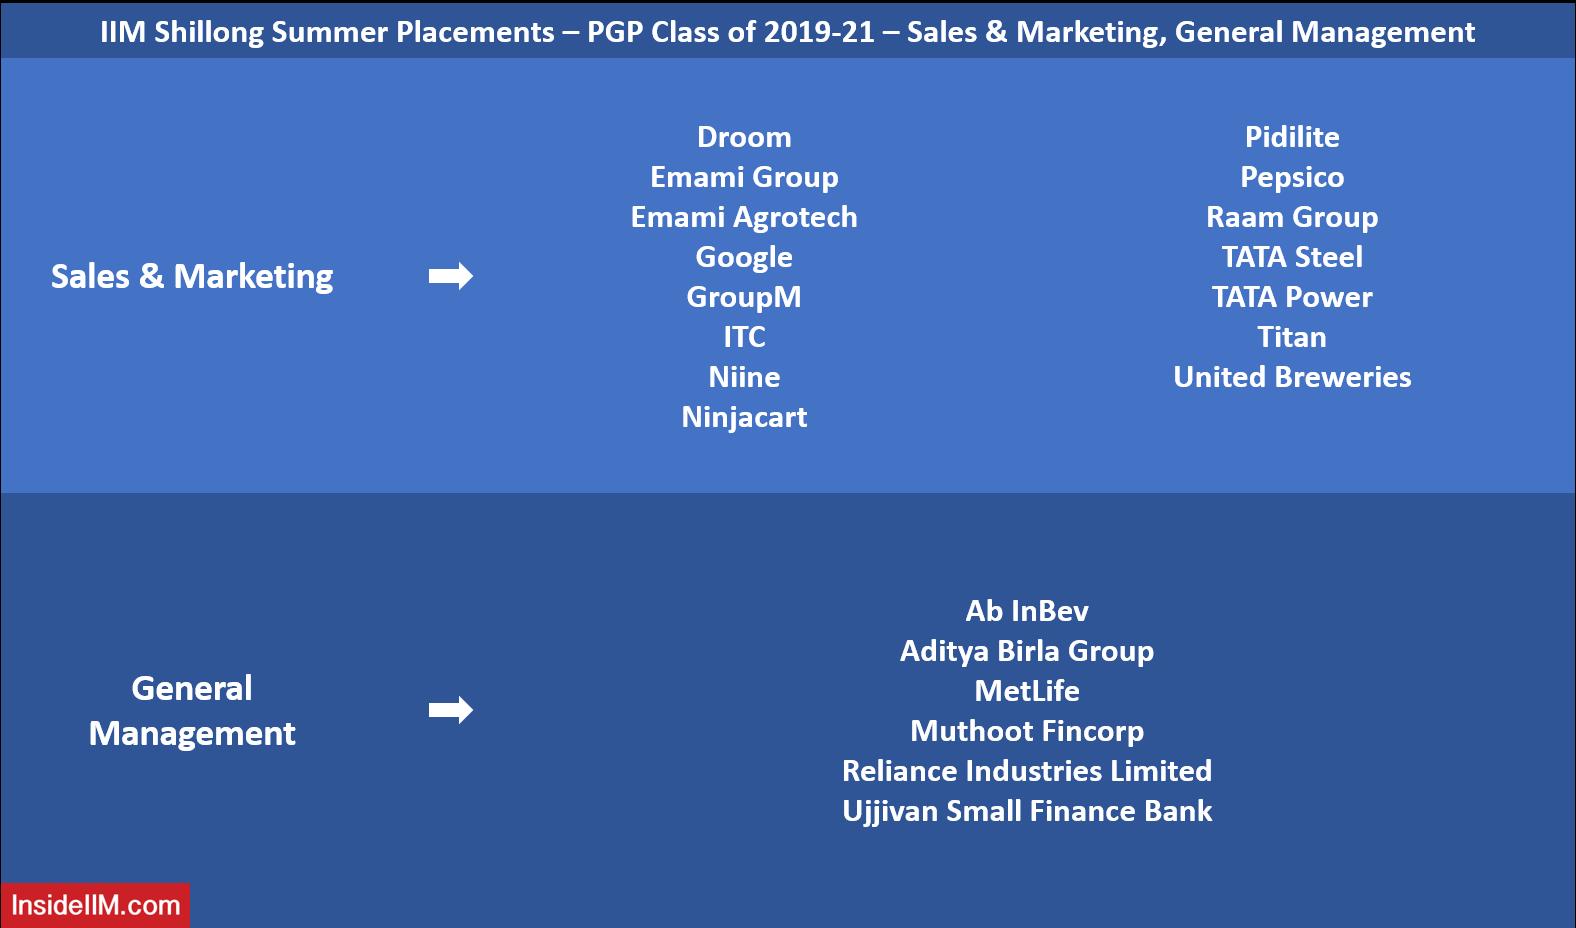 IIM Shillong Summer Placements 2021 - Sales & Marketing, General Management Recruiters